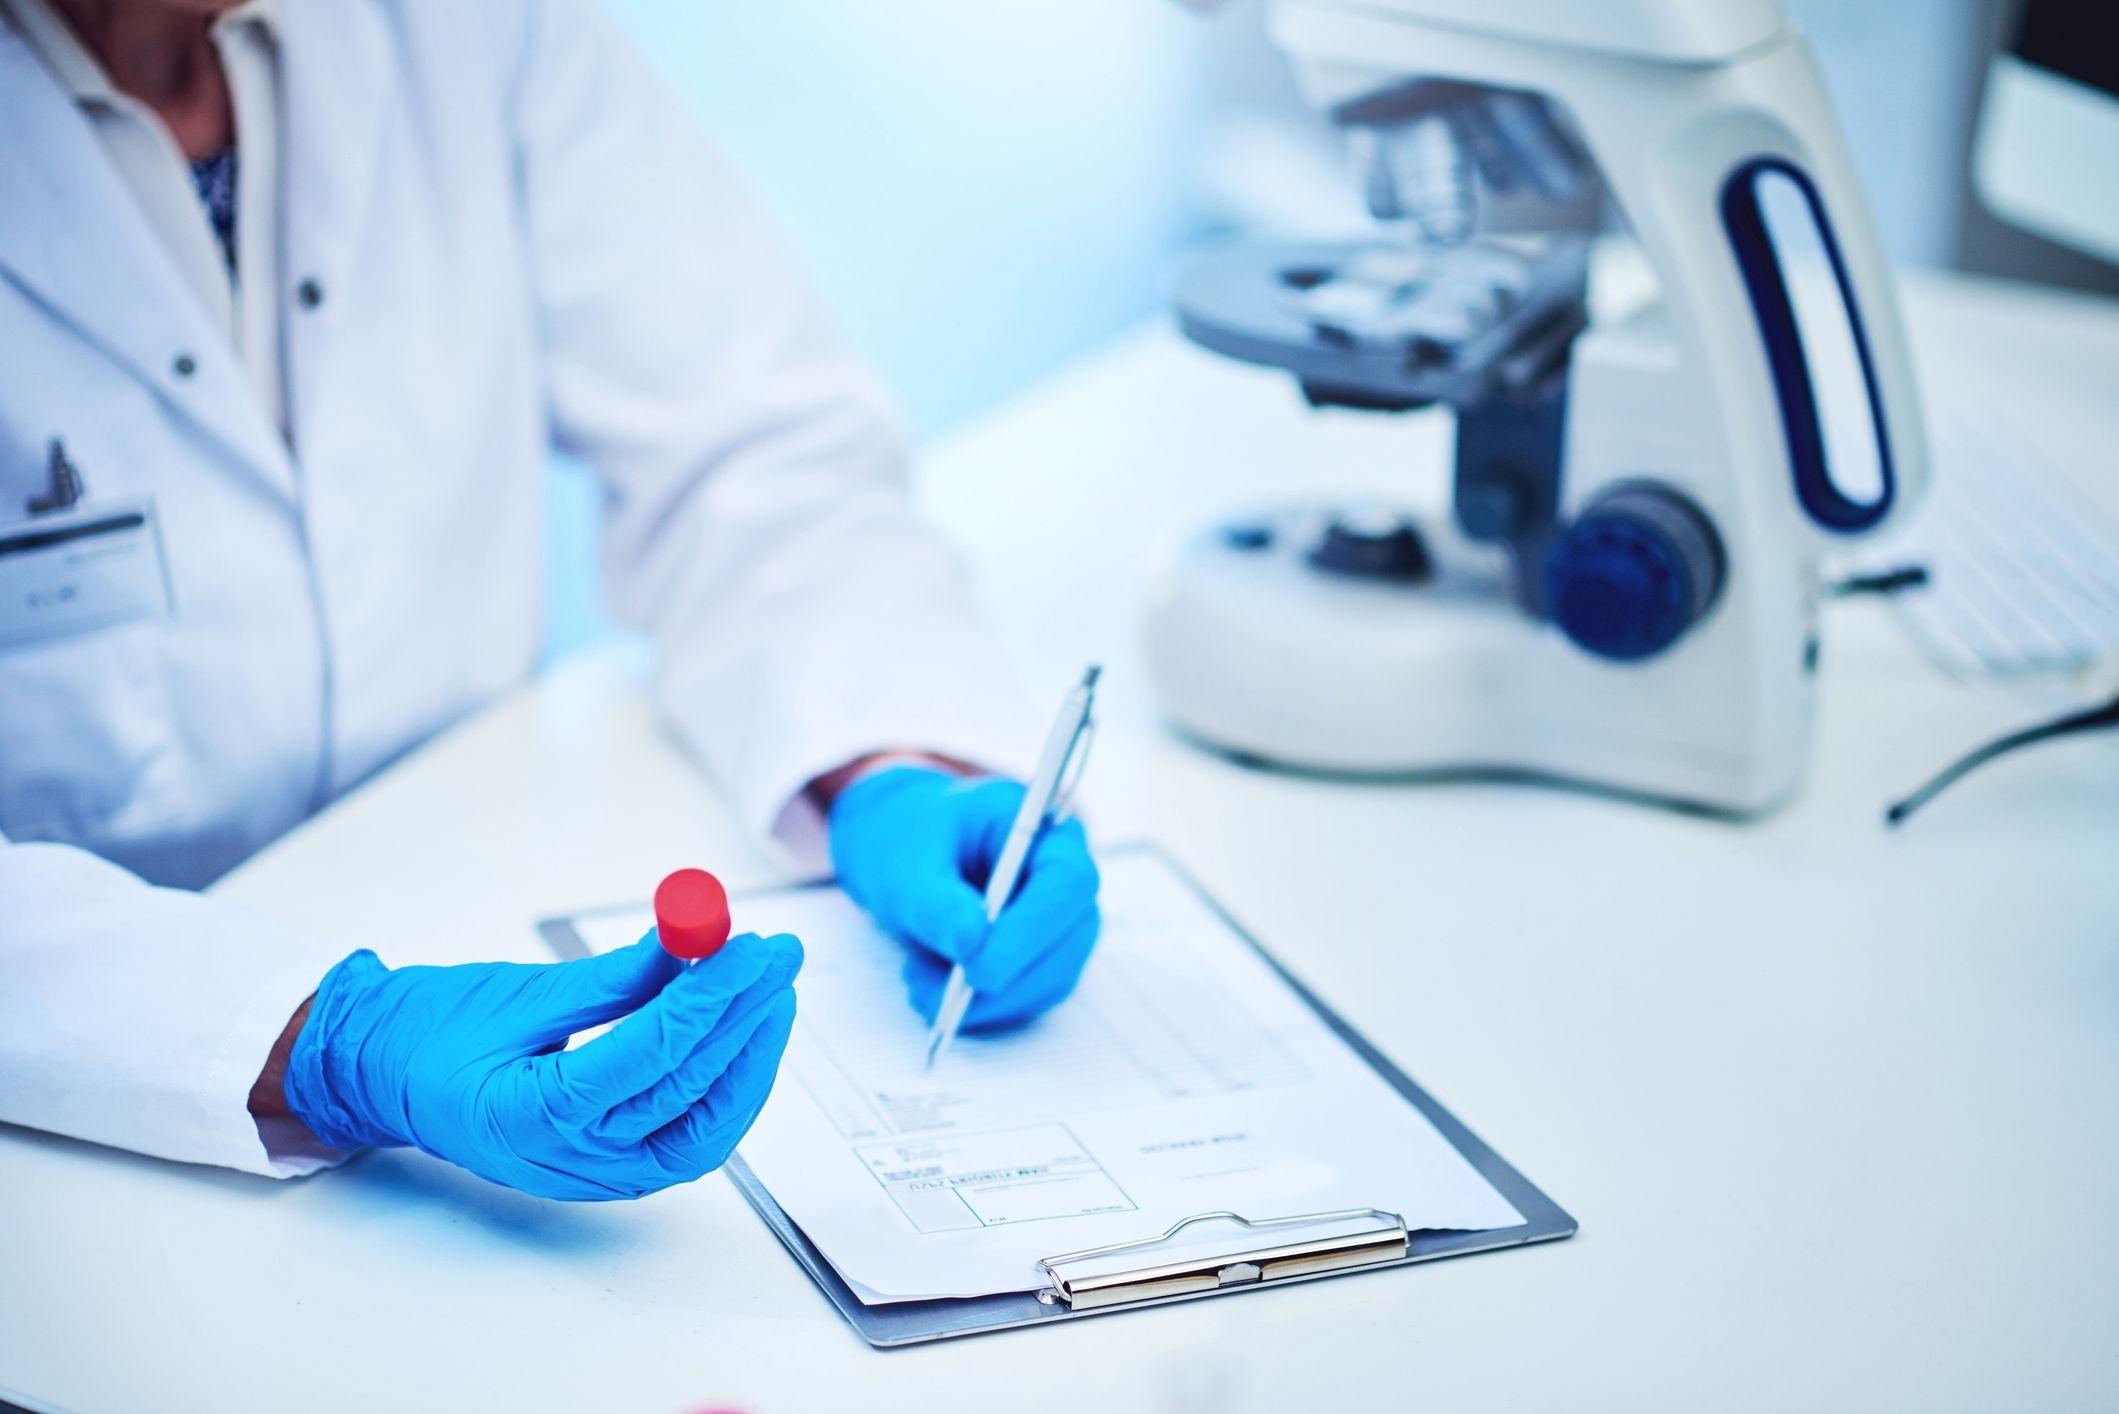 Medical professional holding test tube